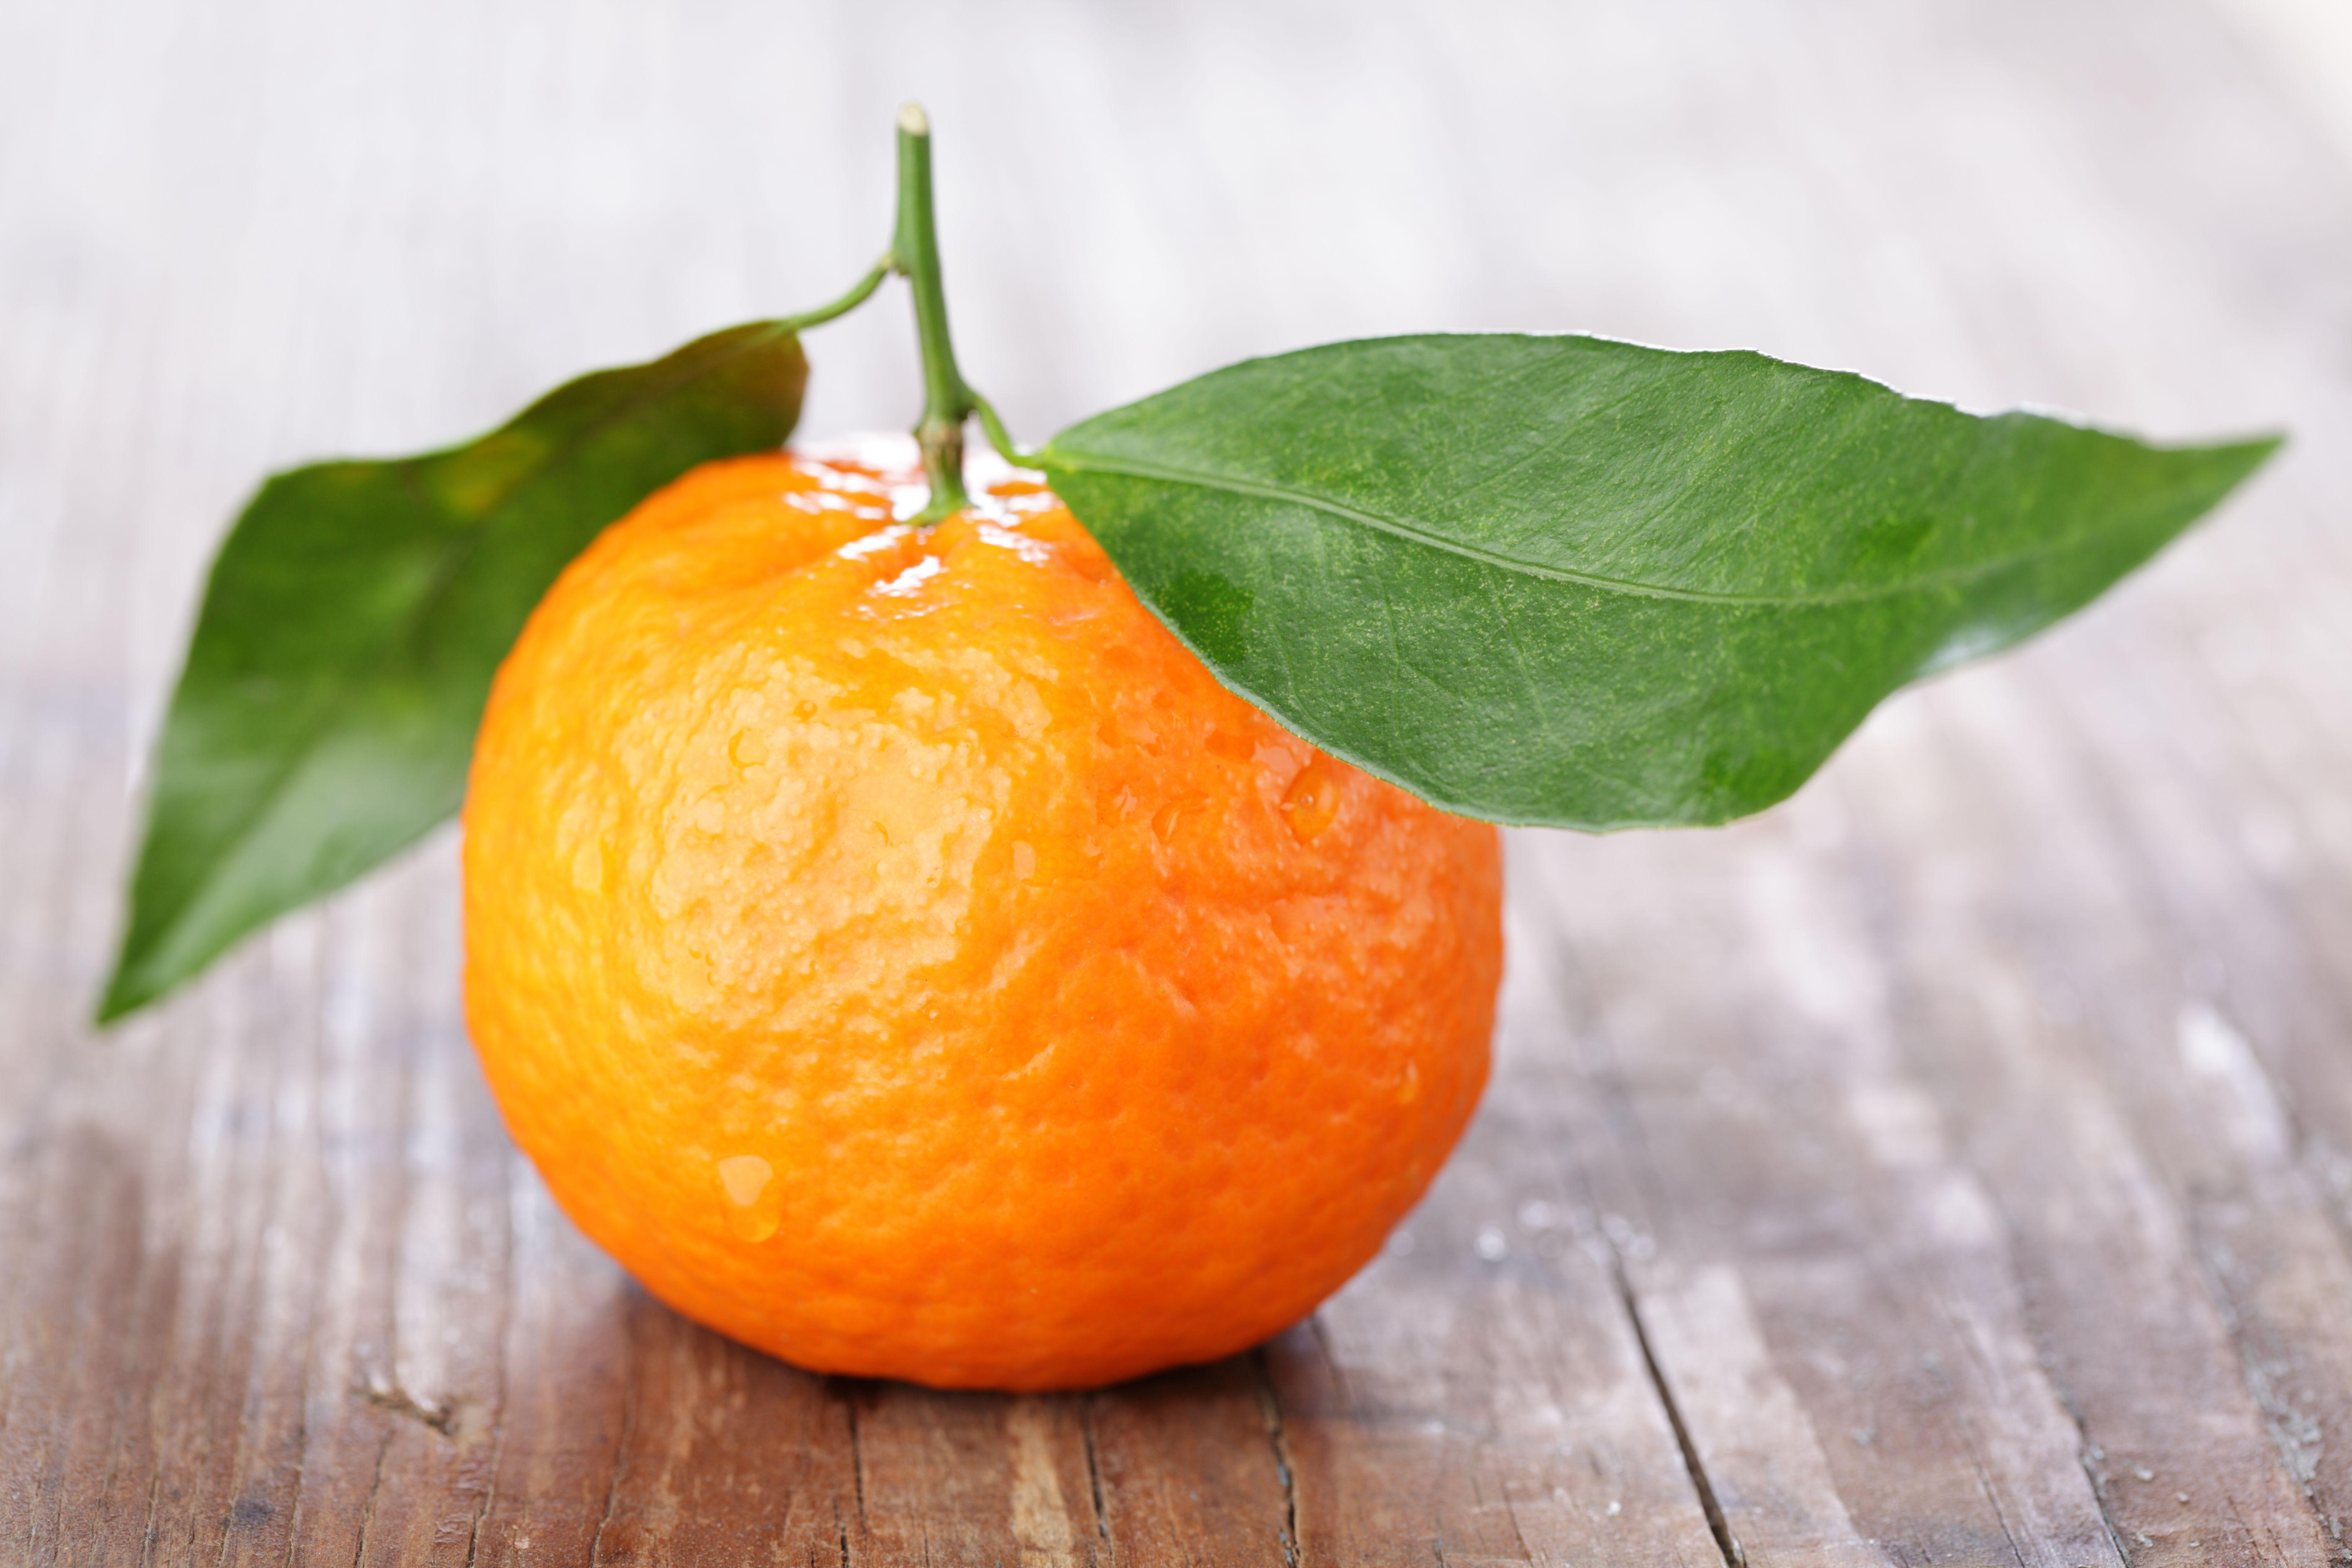 Mandarin orange with leaves